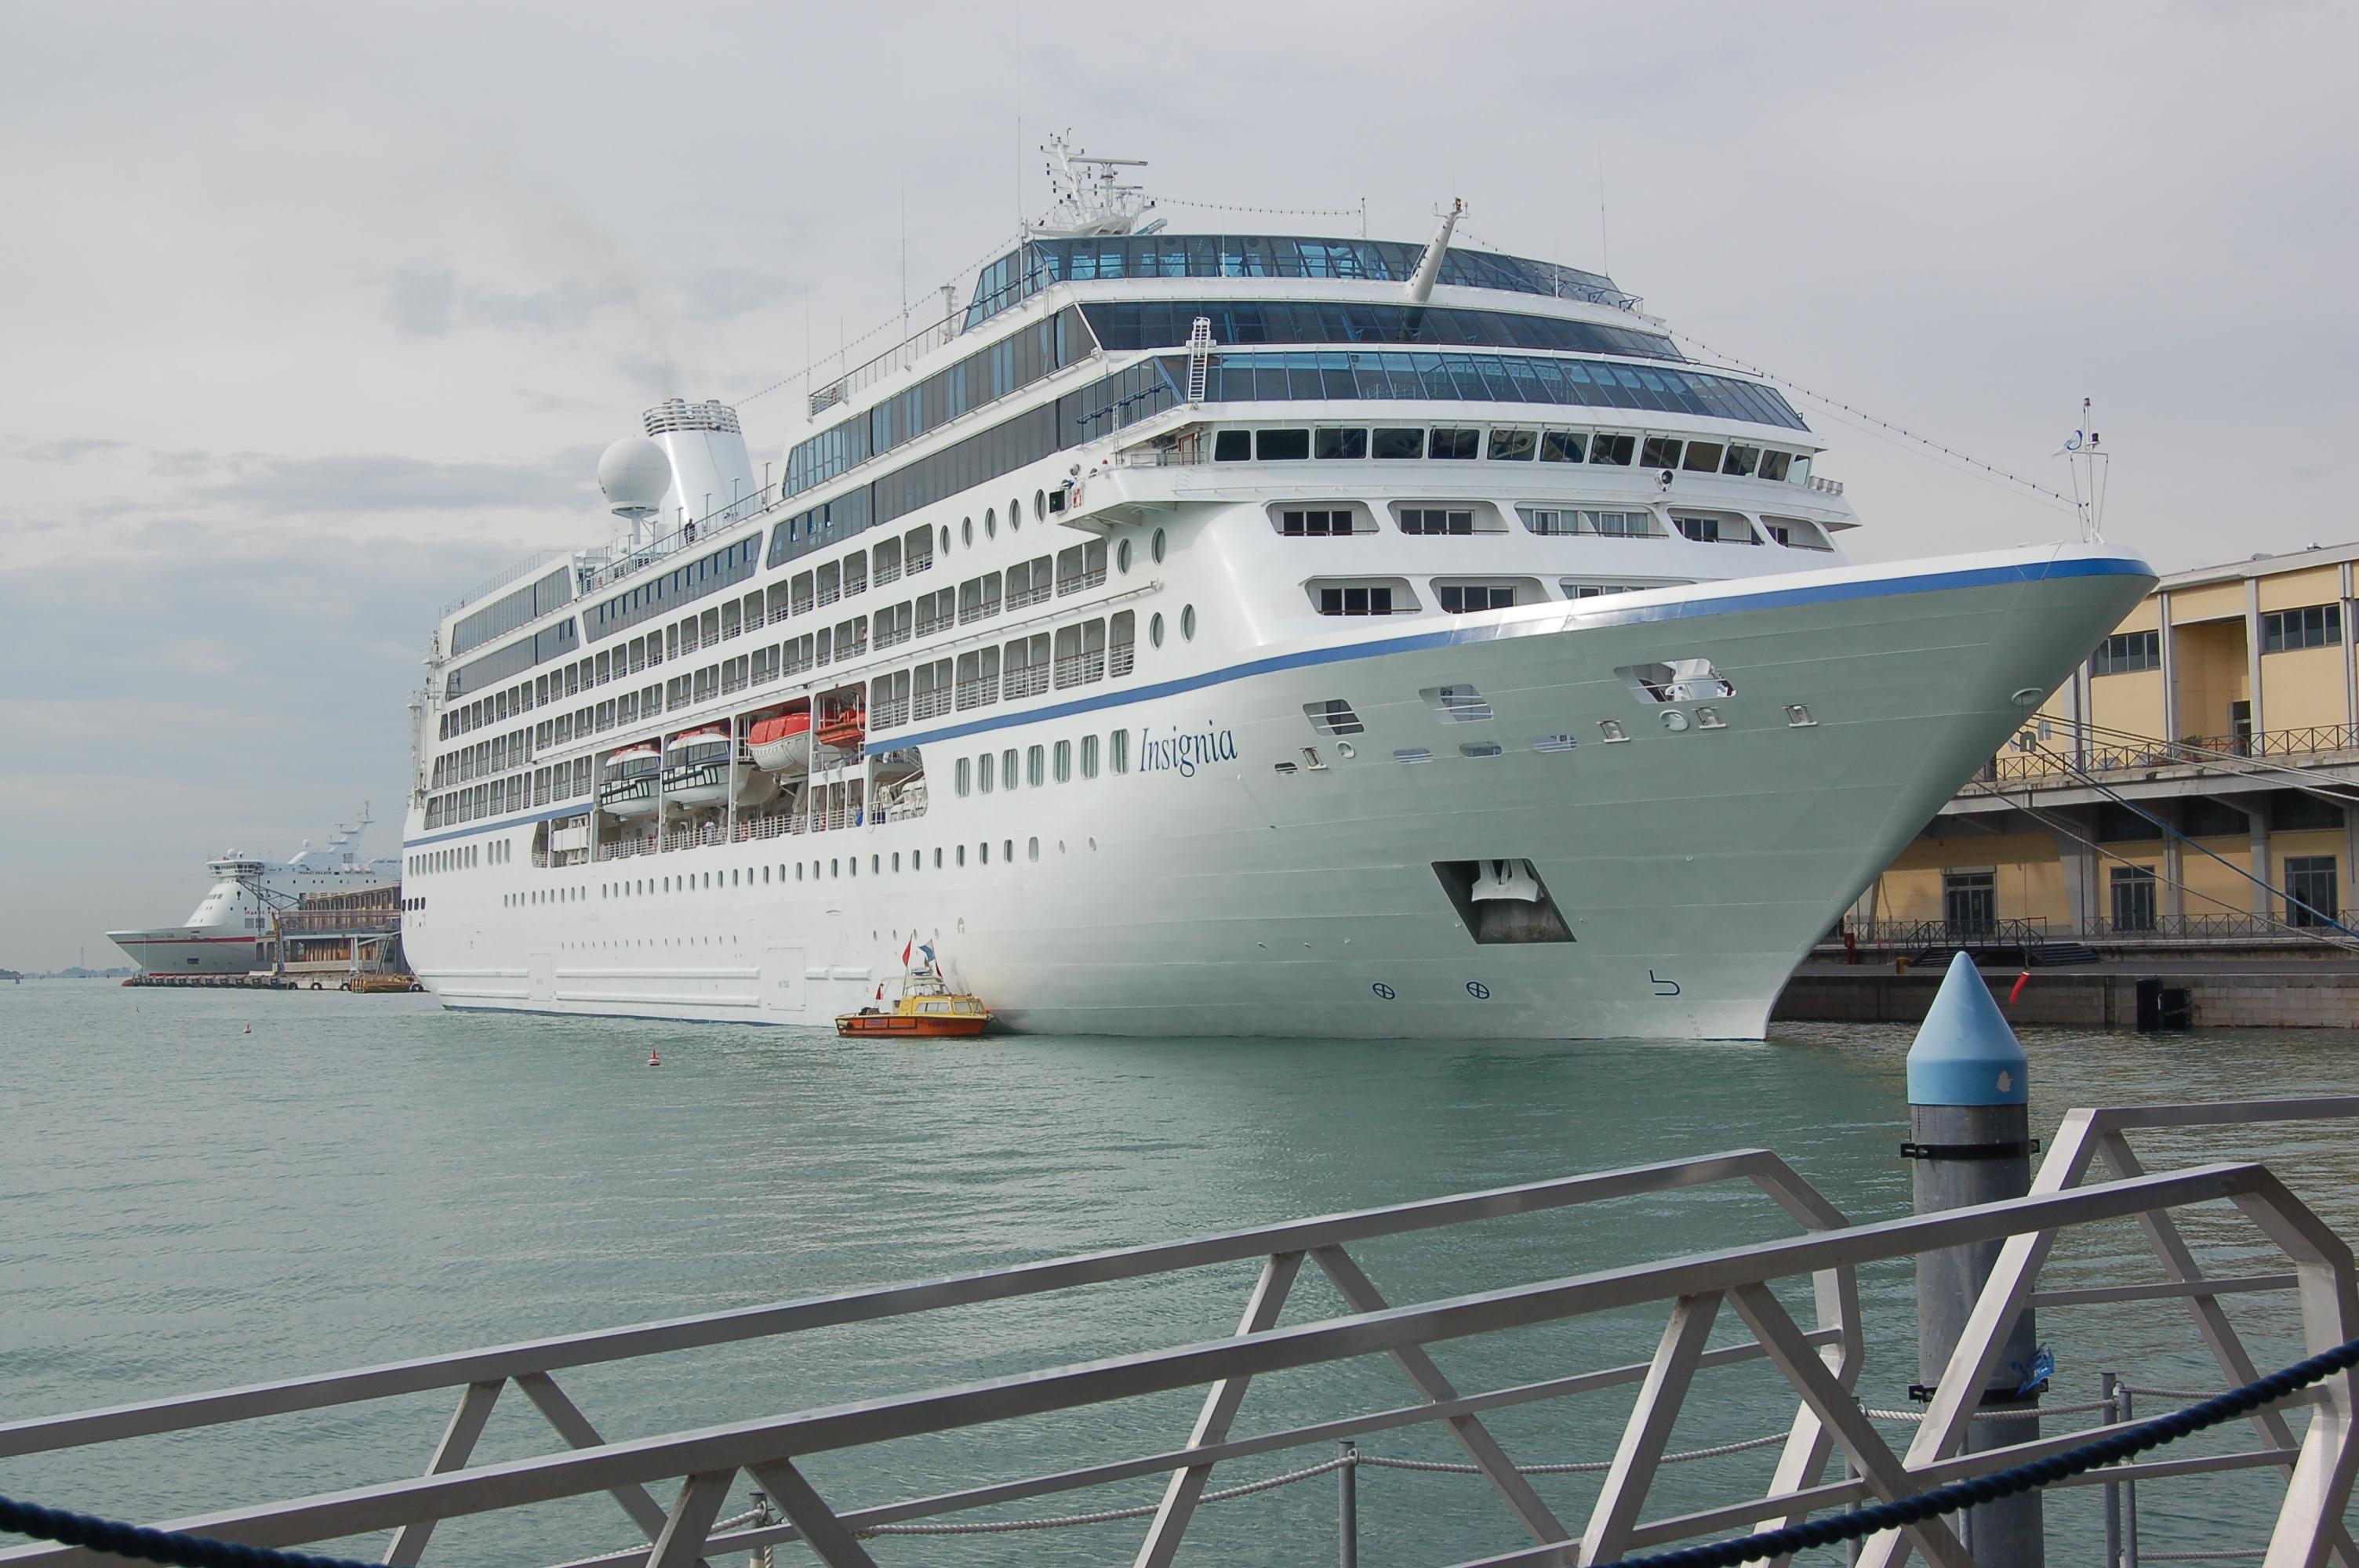 FileMS Insignia In Venice JPG Wikimedia Commons - Insignia cruise ship